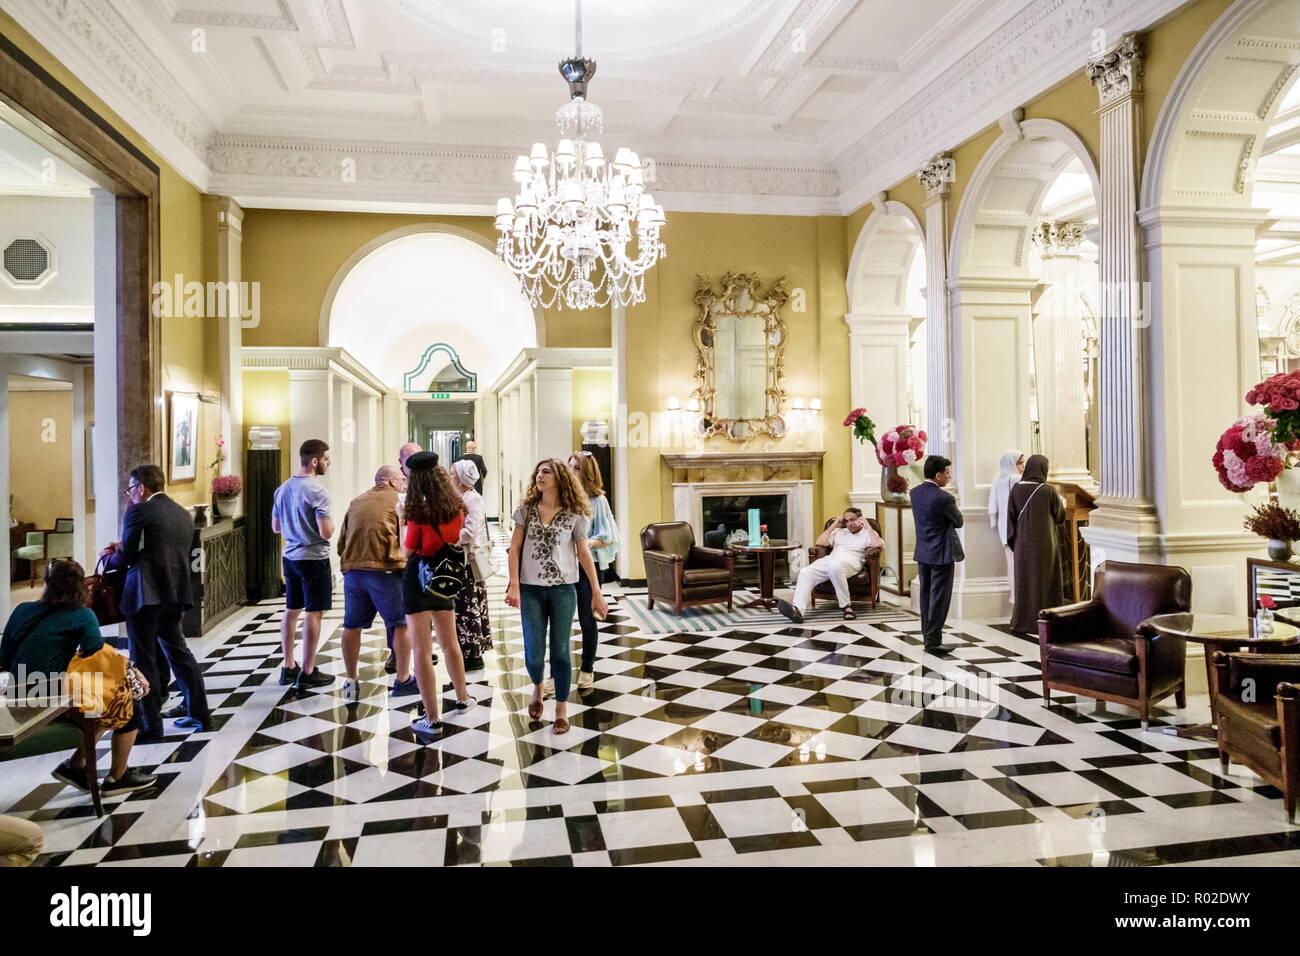 London England United Kingdom Great Britain Mayfair Claridge's hotel 5-star luxury historic building inside interior lobby chandelier black white chec - Stock Image